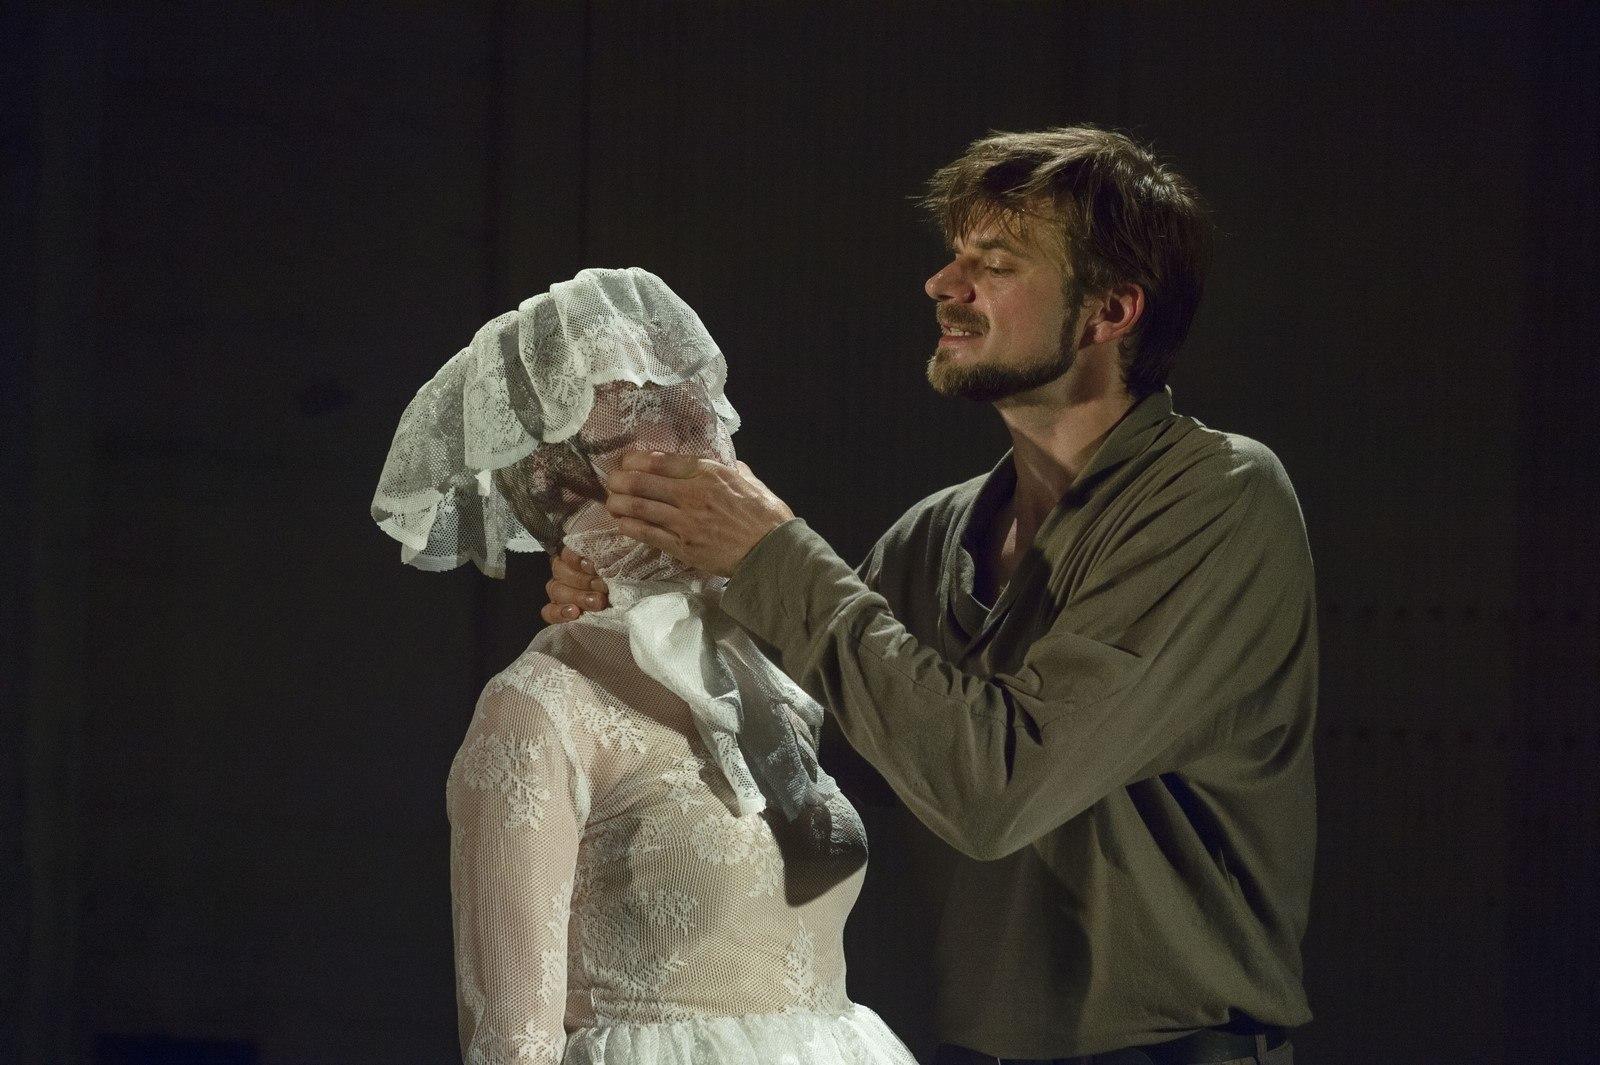 Anmeldelse: Ashes to Ashes, Østre Kapel (Sydhavn Teater)